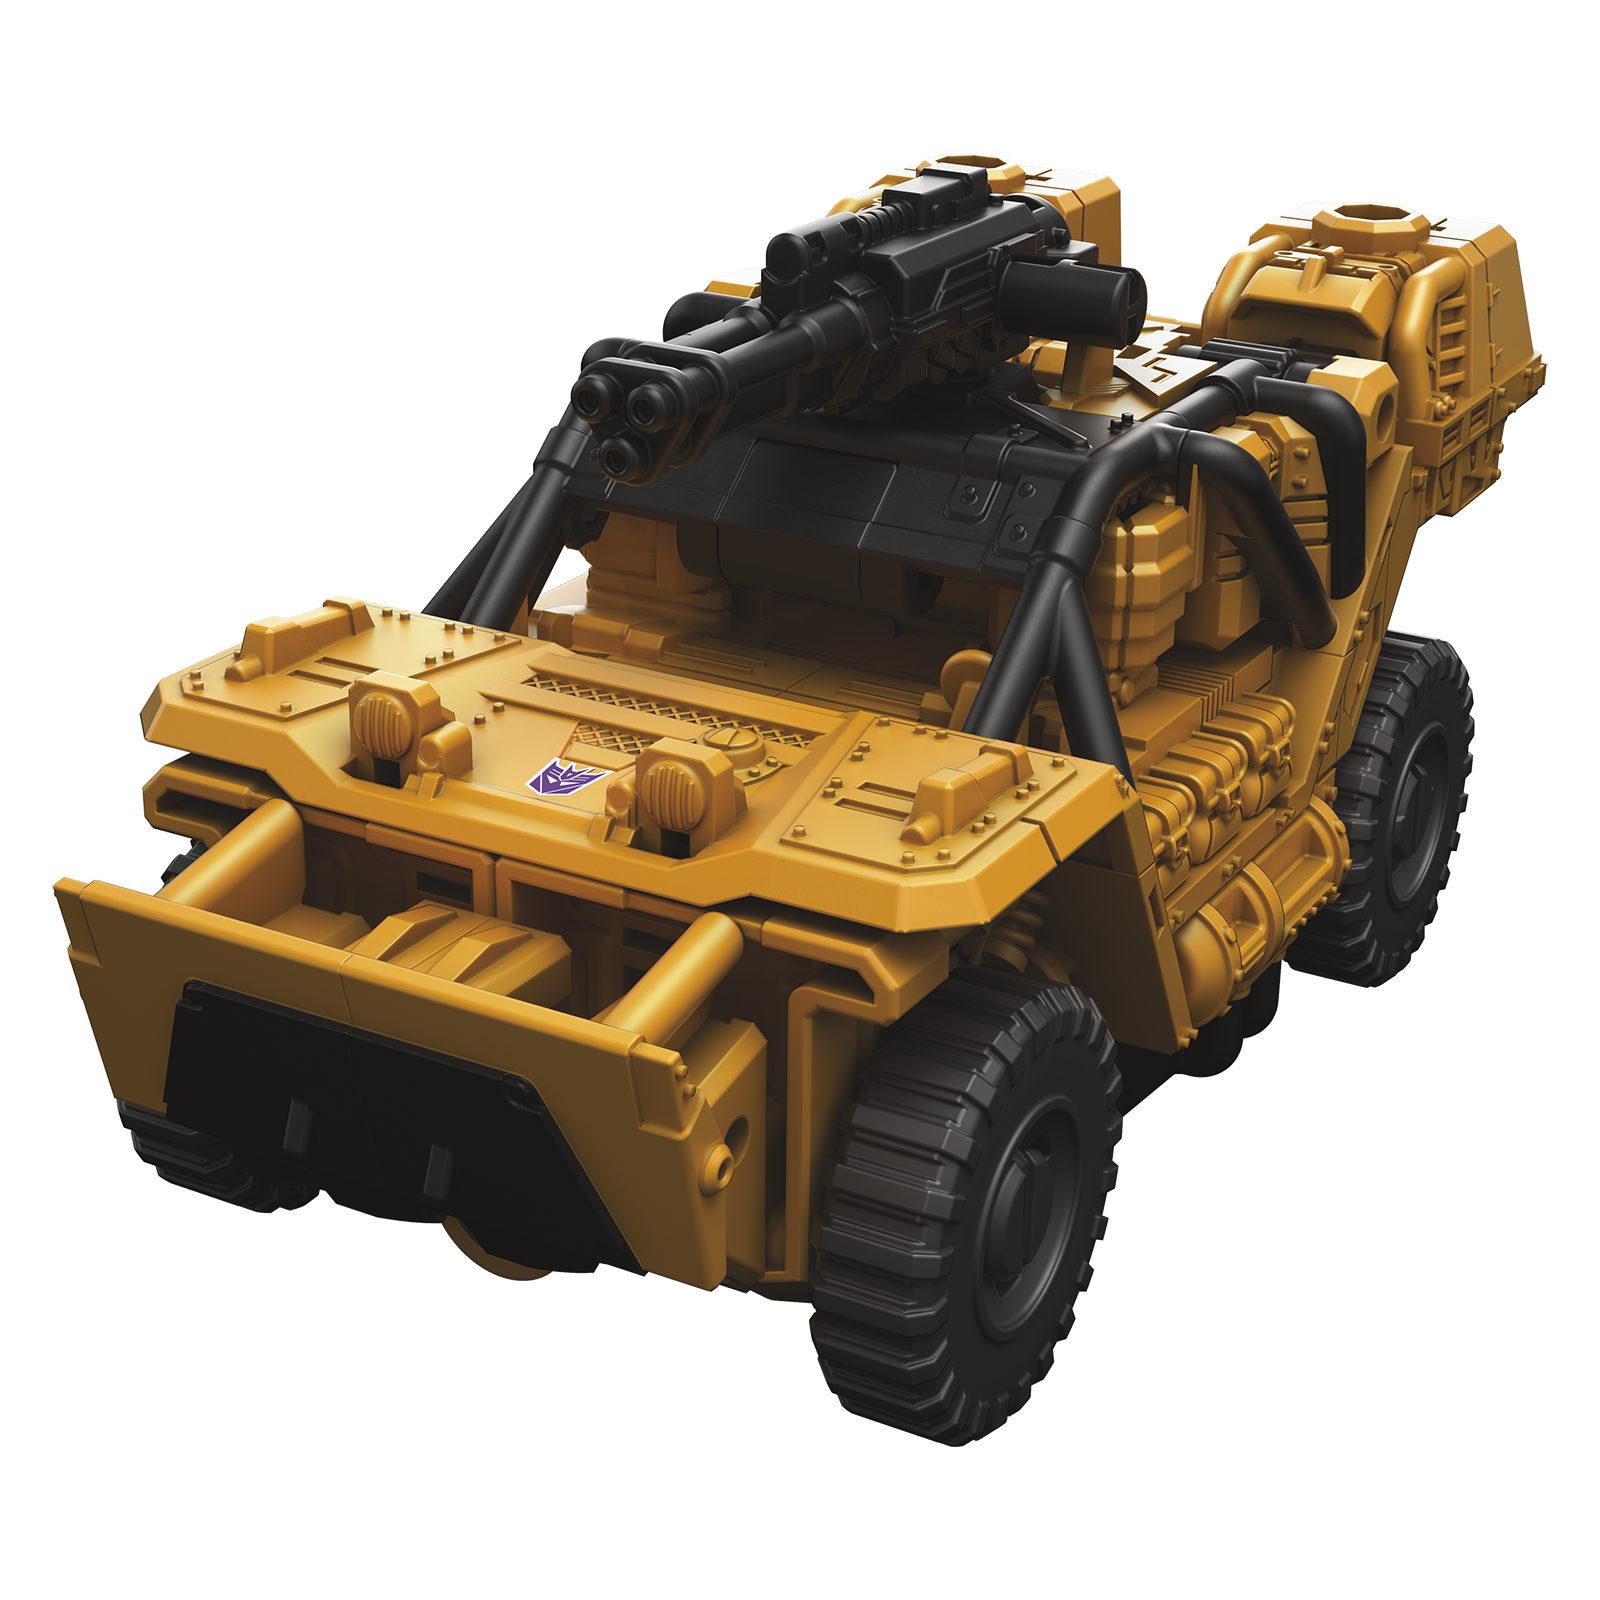 Deluxe_Swindle_Vehicle_Right.jpg